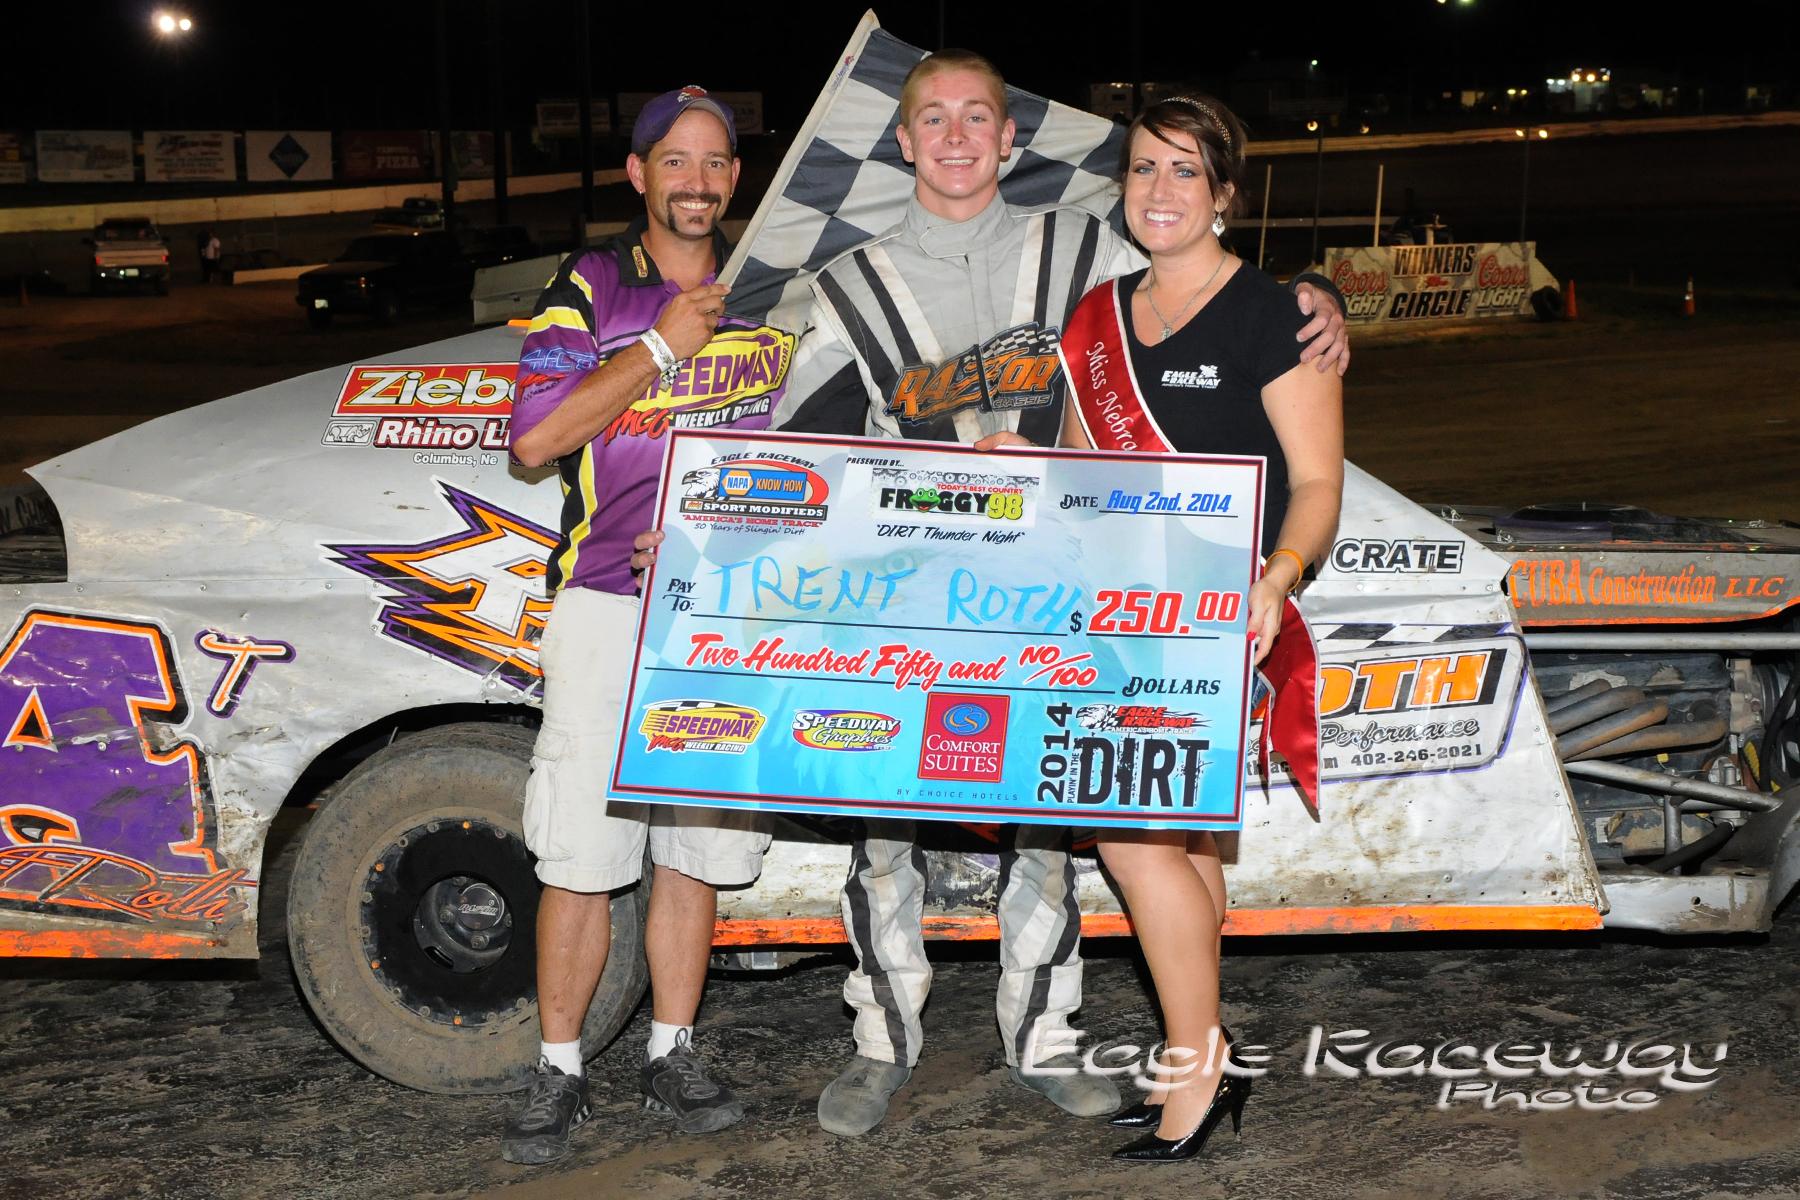 Eagle-08-02-14-369-Trent-Roth-with-Miss-Nebraska-Cup-Elle-Patocka-and-flagman-Billy-Lloyd-JoeOrthPhotos